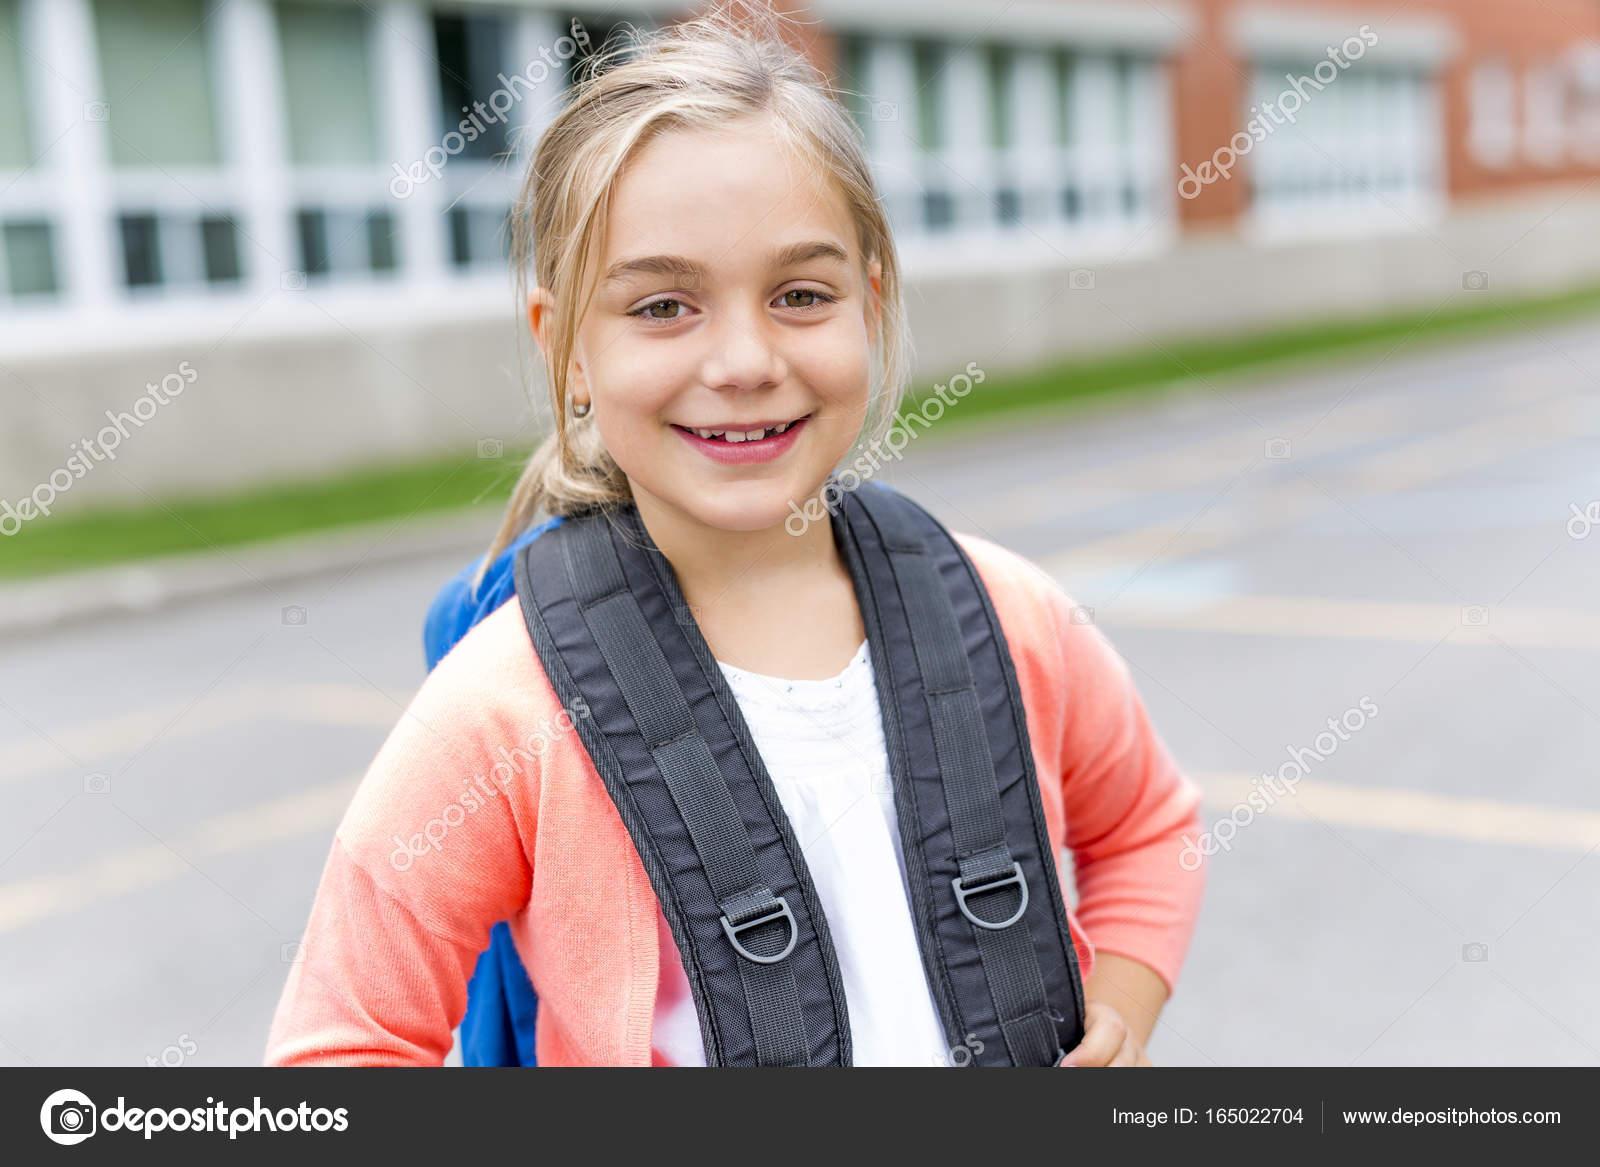 c71d2ee3ace Ένα οκτώ χρόνια παλιό σχολείο κορίτσι κοντά τις αυλές των σχολείων — Εικόνα  από Lopolo